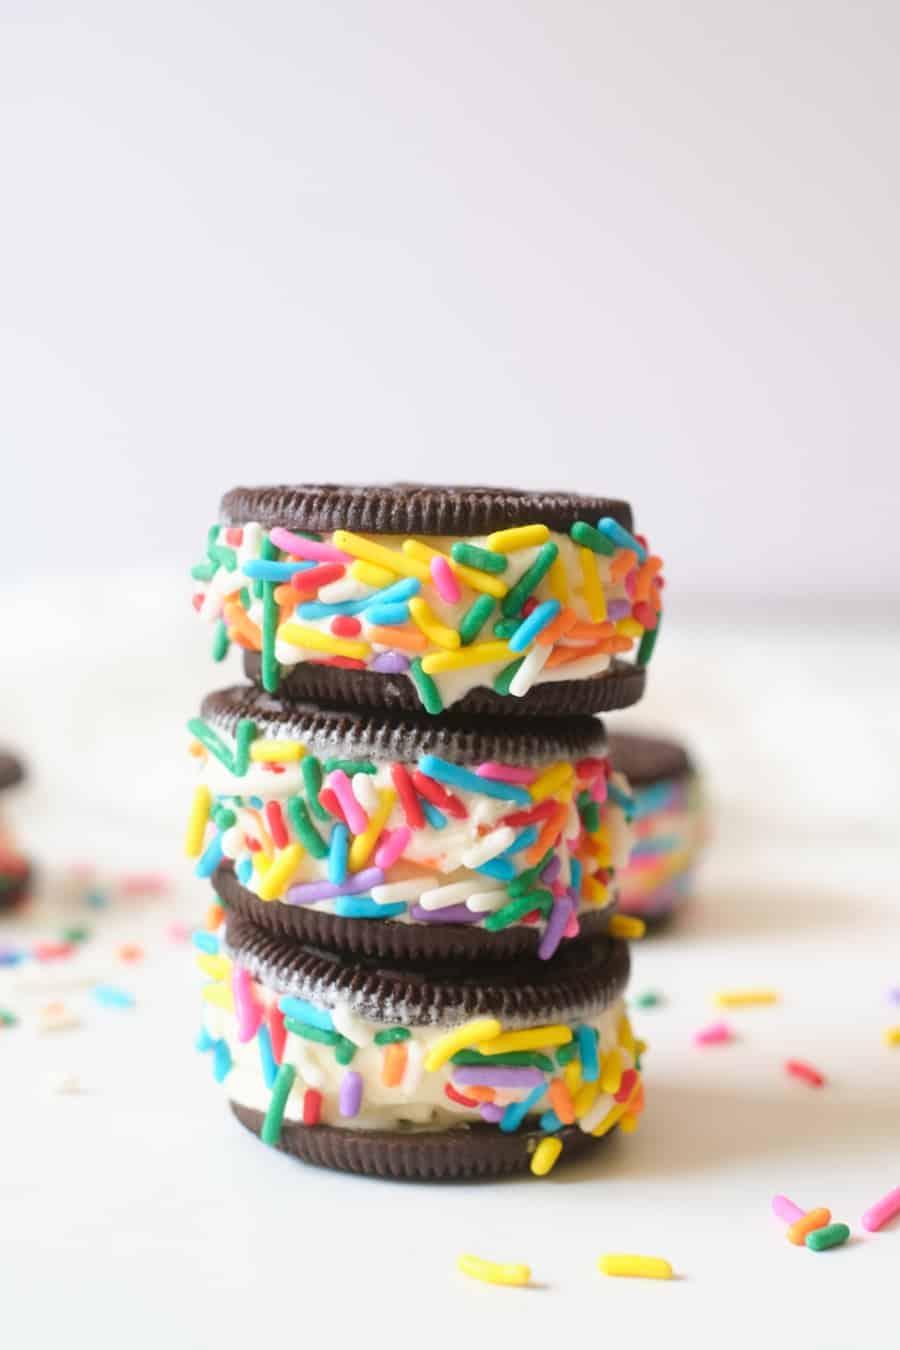 Oreo Cookie Ice Cream Sandwich